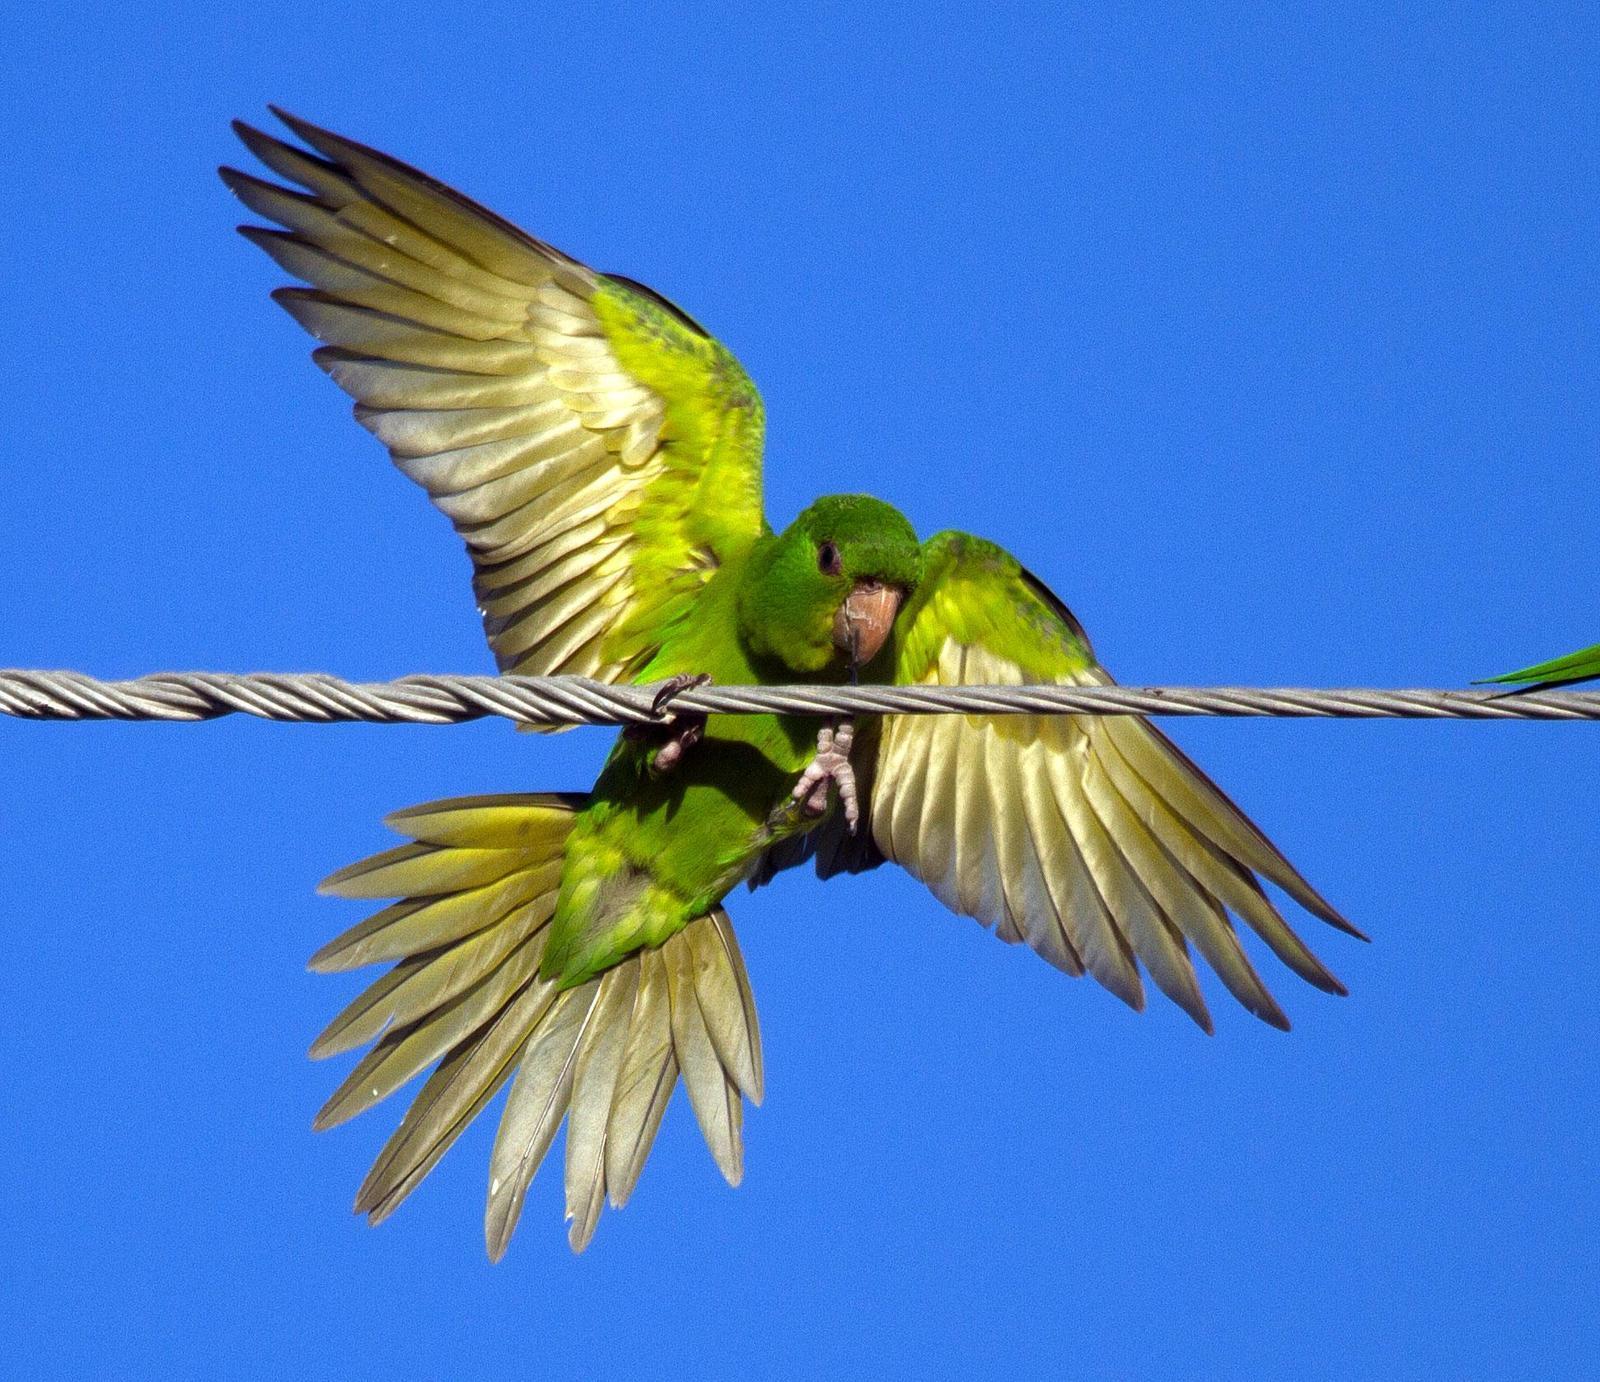 Green Parakeet Photo by Scott Berglund